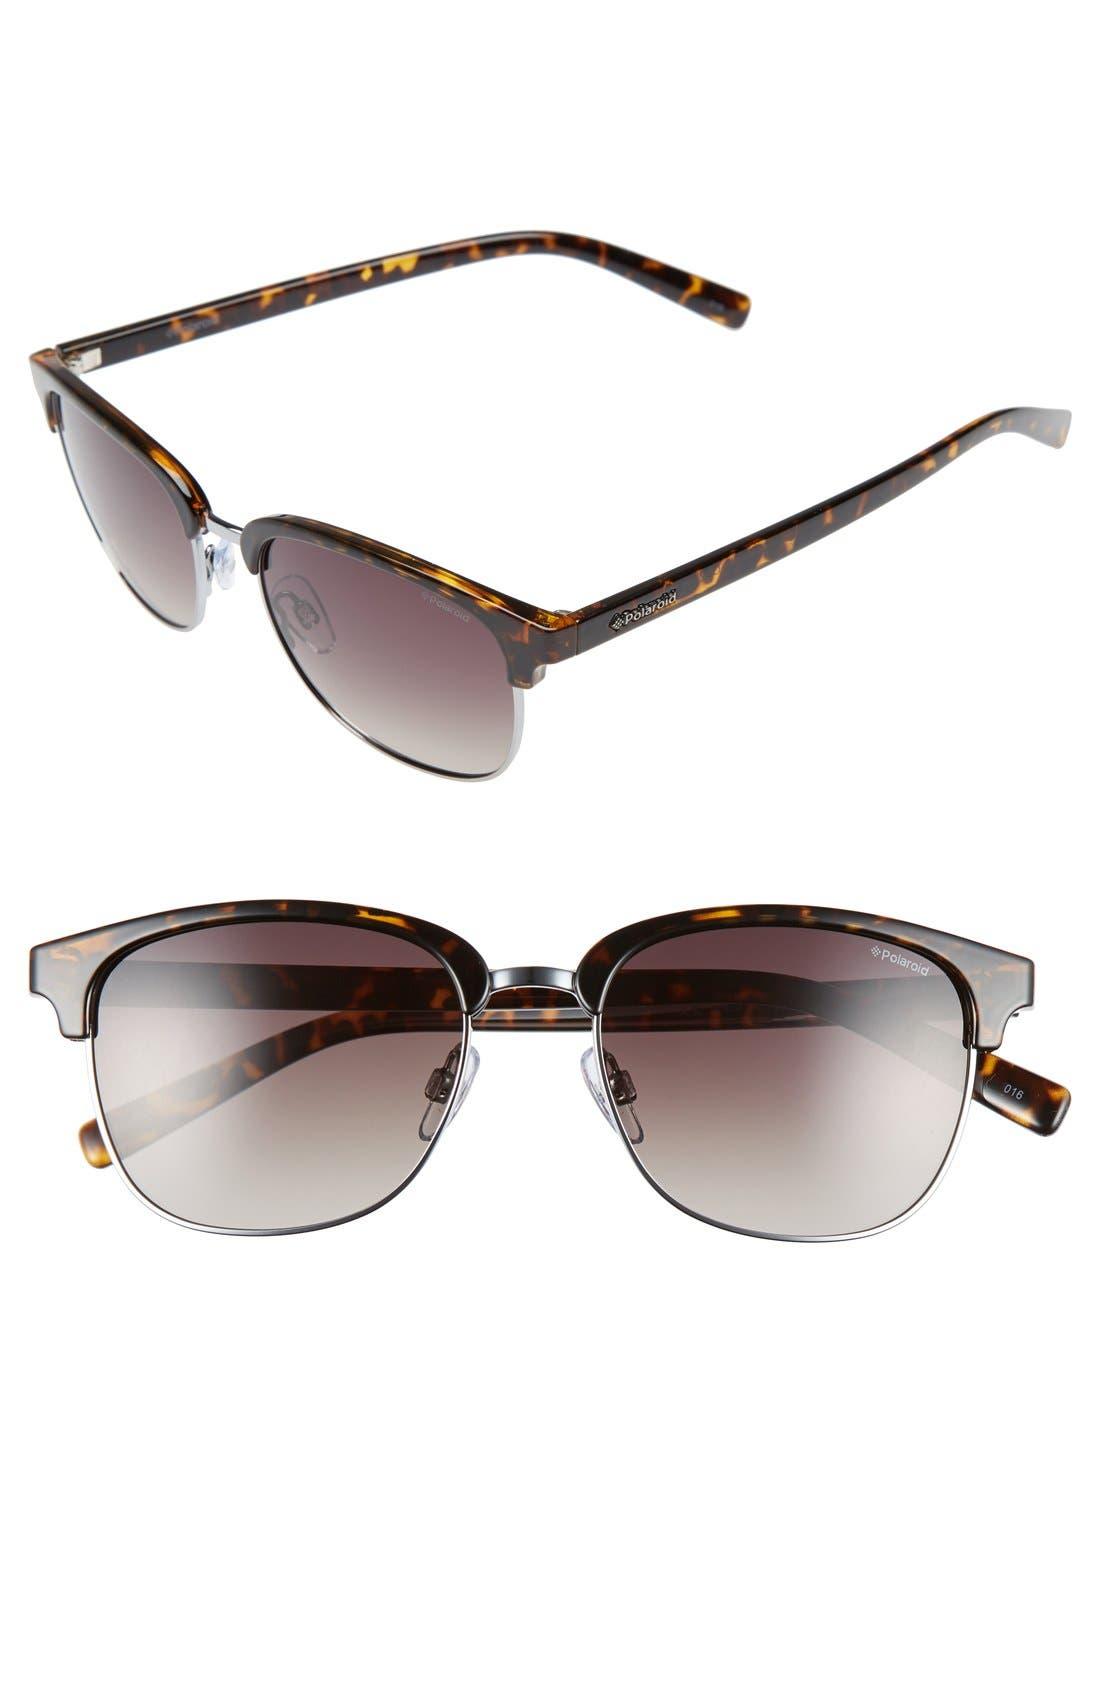 55mm Polarized Sunglasses,                         Main,                         color, 045